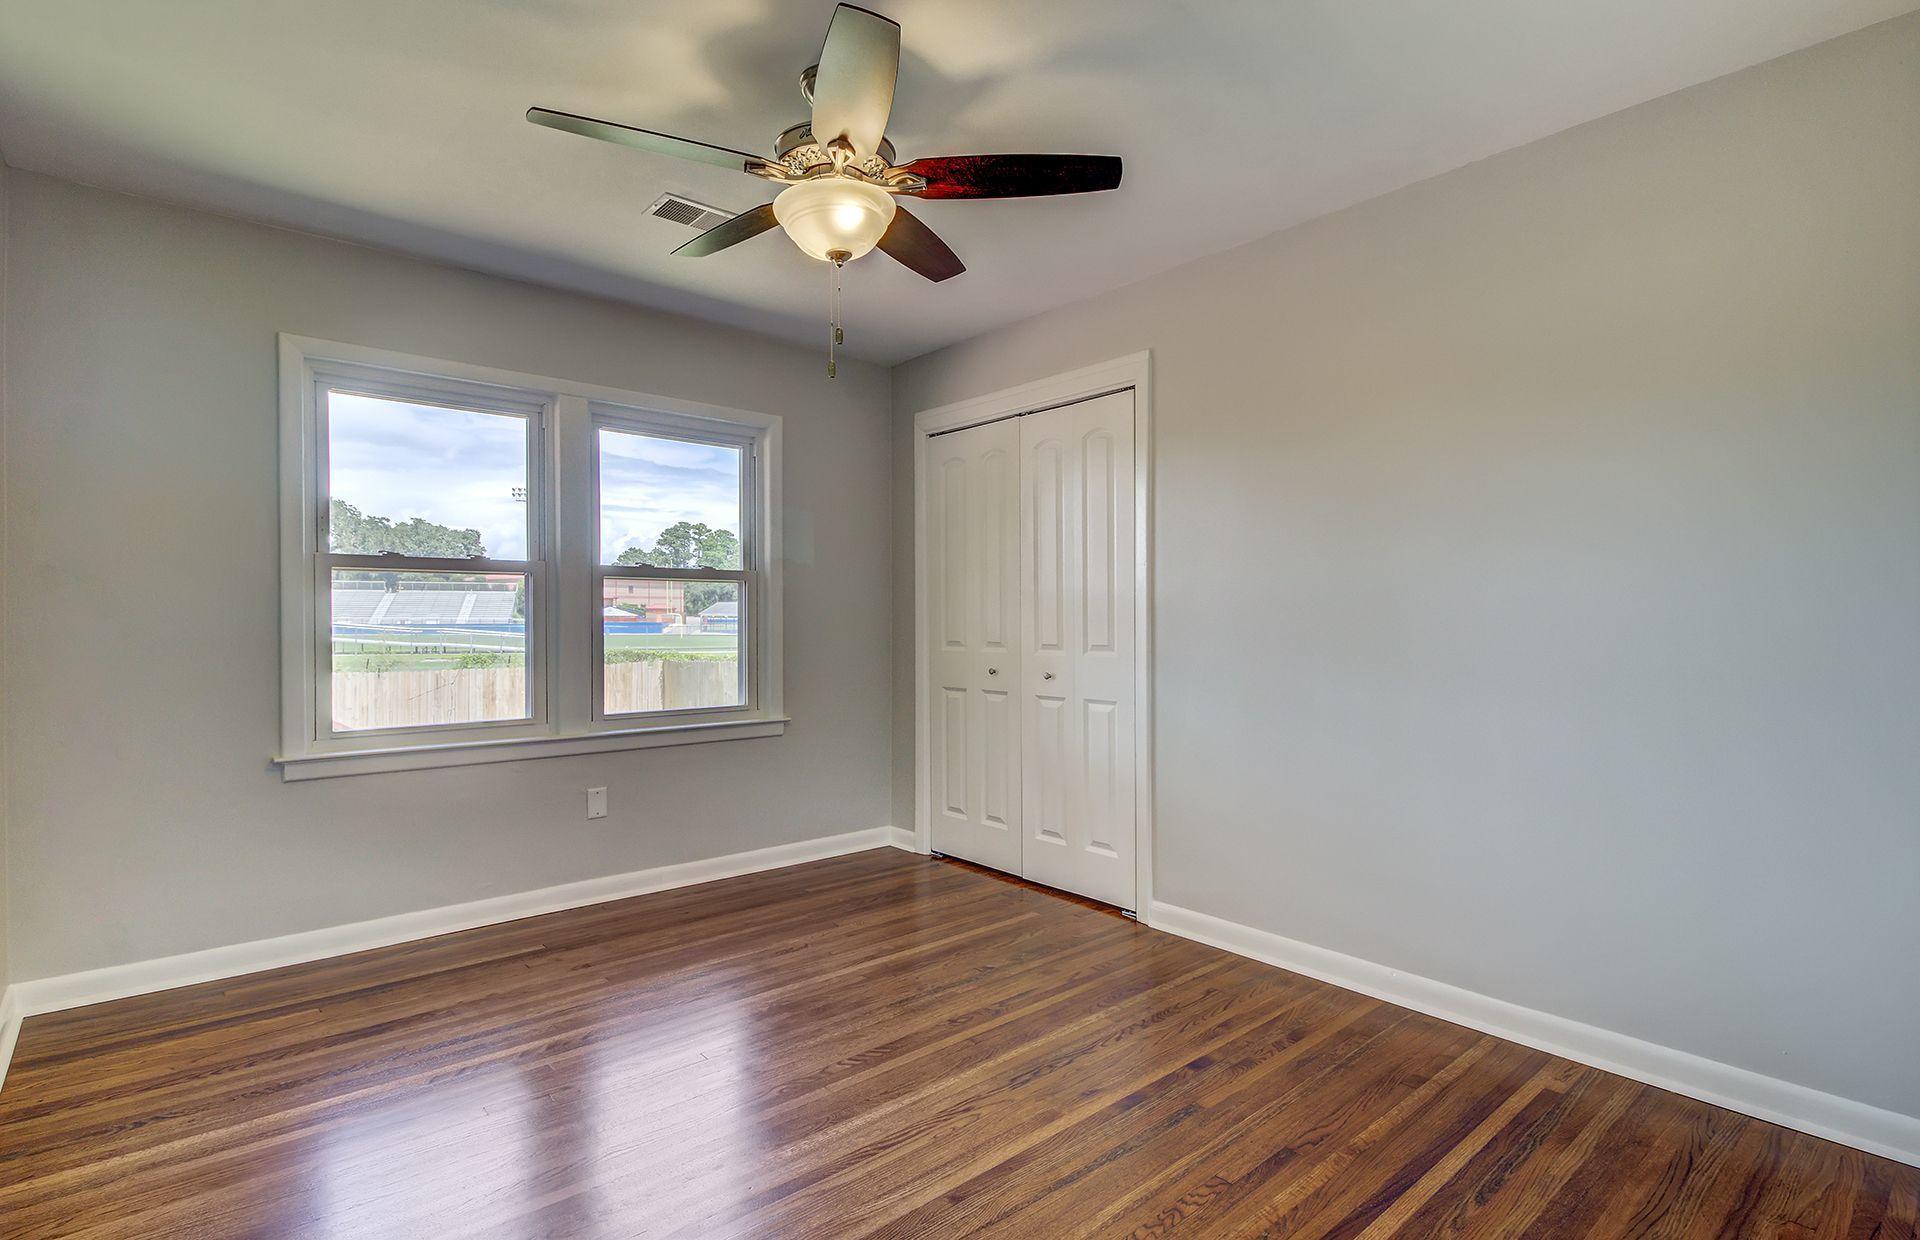 Belvedere Estates Homes For Sale - 6010 Ridgecrest, Hanahan, SC - 0